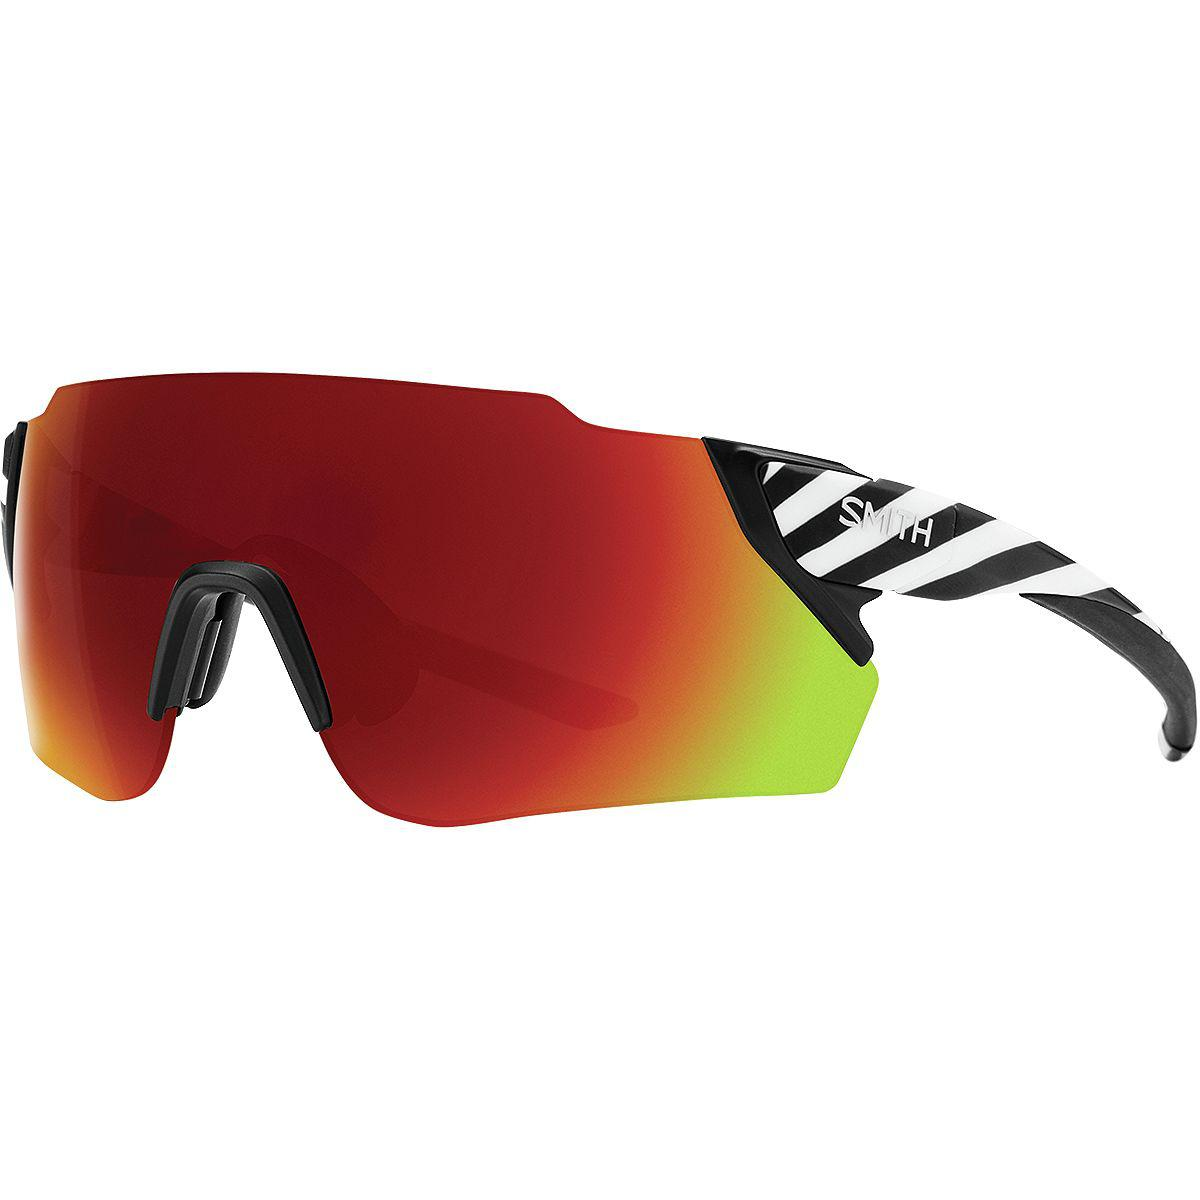 9b09fabfa5 Lyst - Smith Attack Max Chromapop Sunglasses in Red for Men